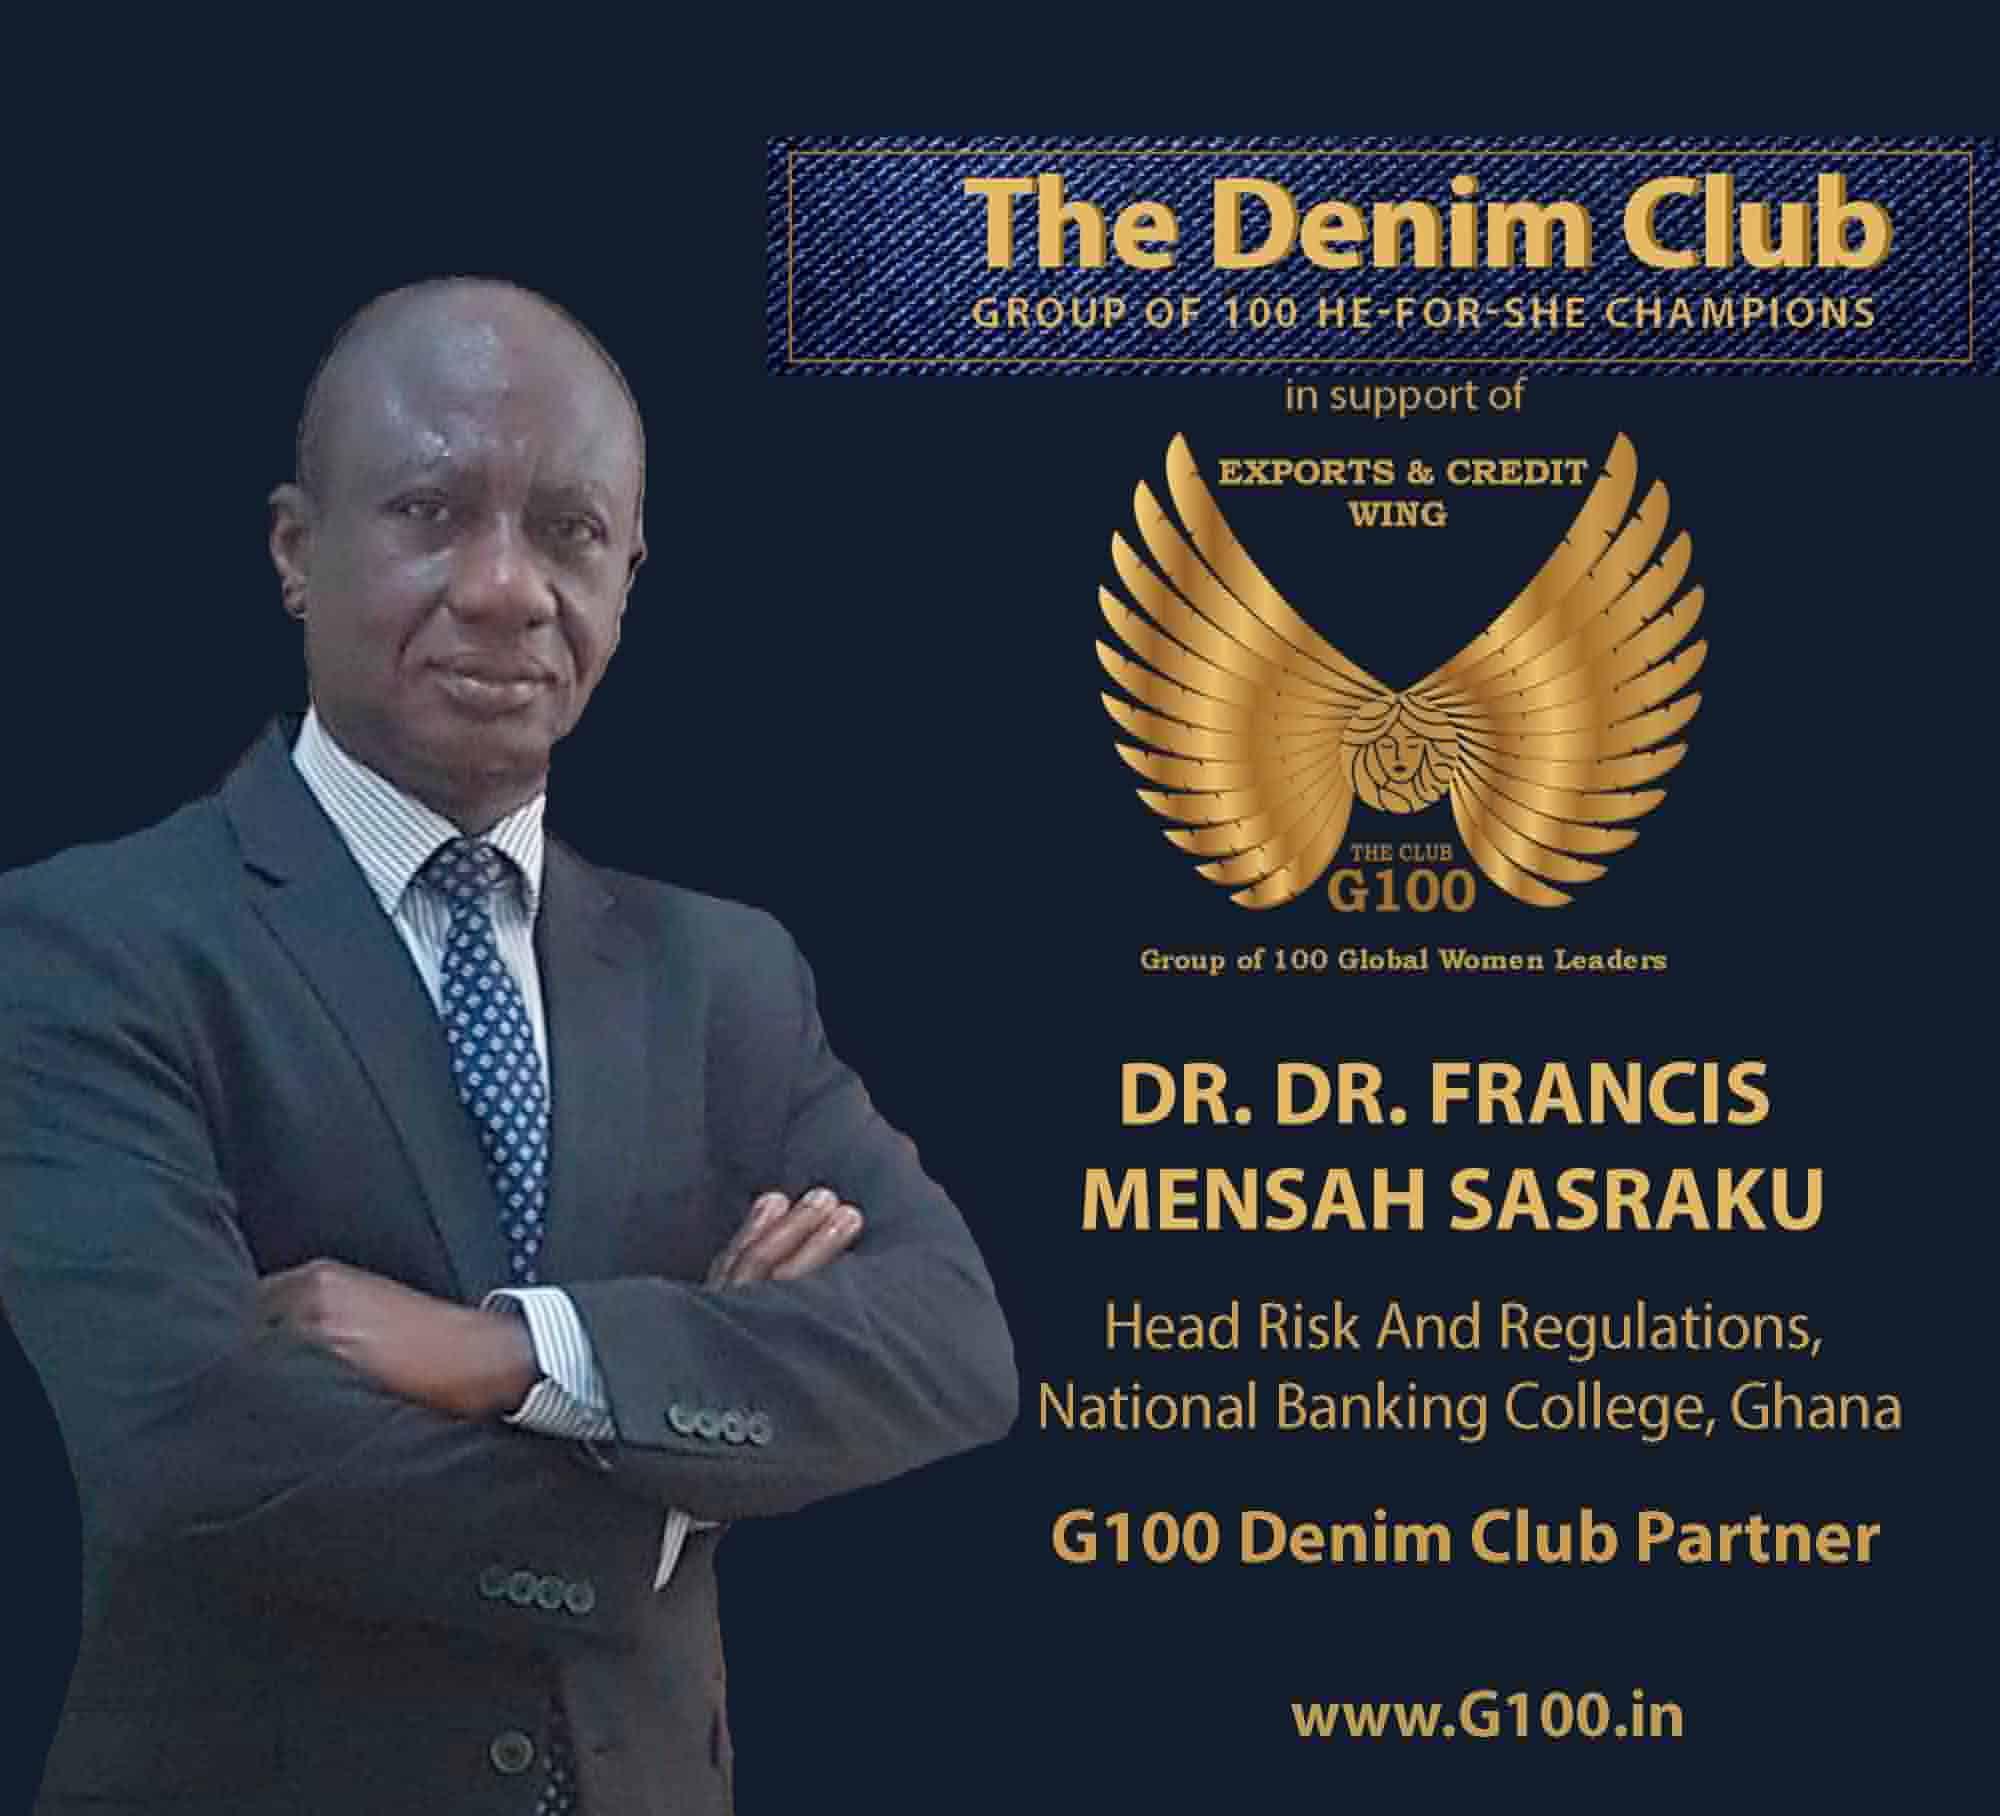 Dr. Francis Mensah Sasraku